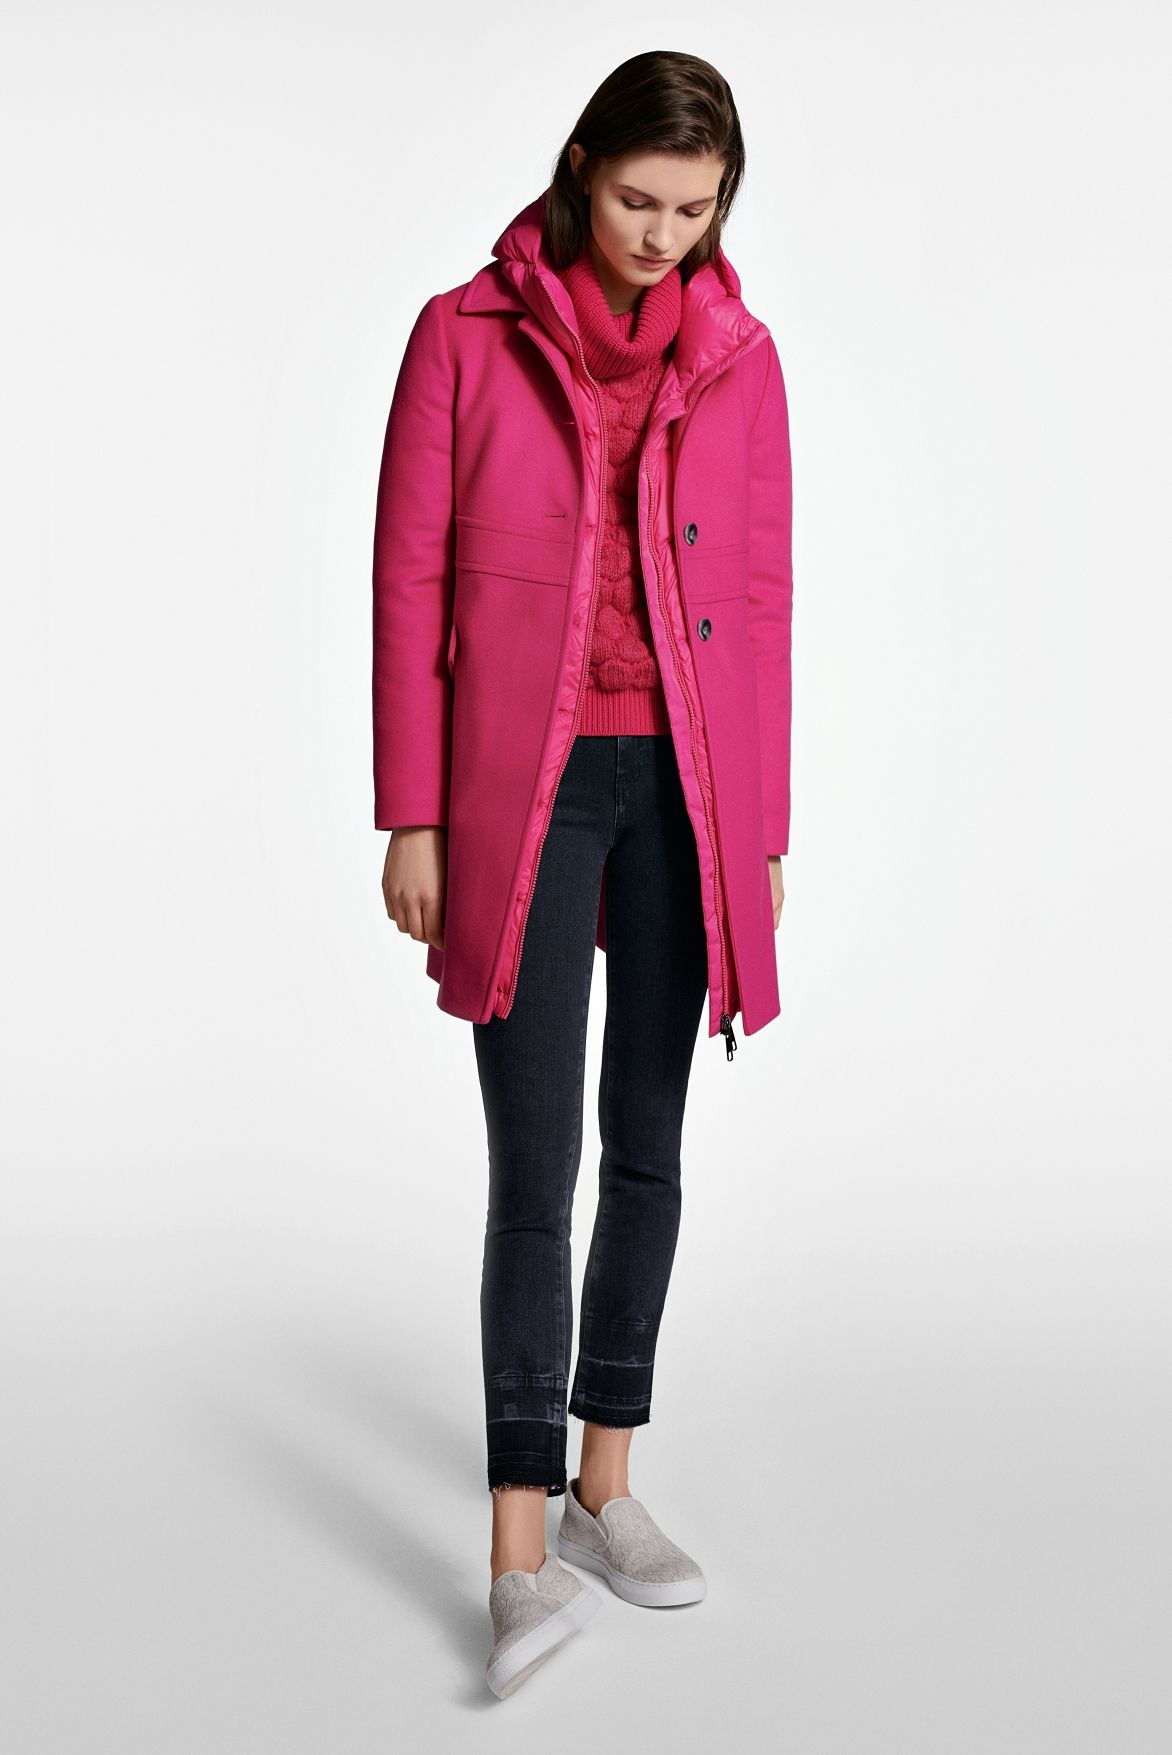 The Boss Womenswear Fall Winter 2018 Collection Ladies Blouse Designs Women Wear Fashion [ 1755 x 1172 Pixel ]